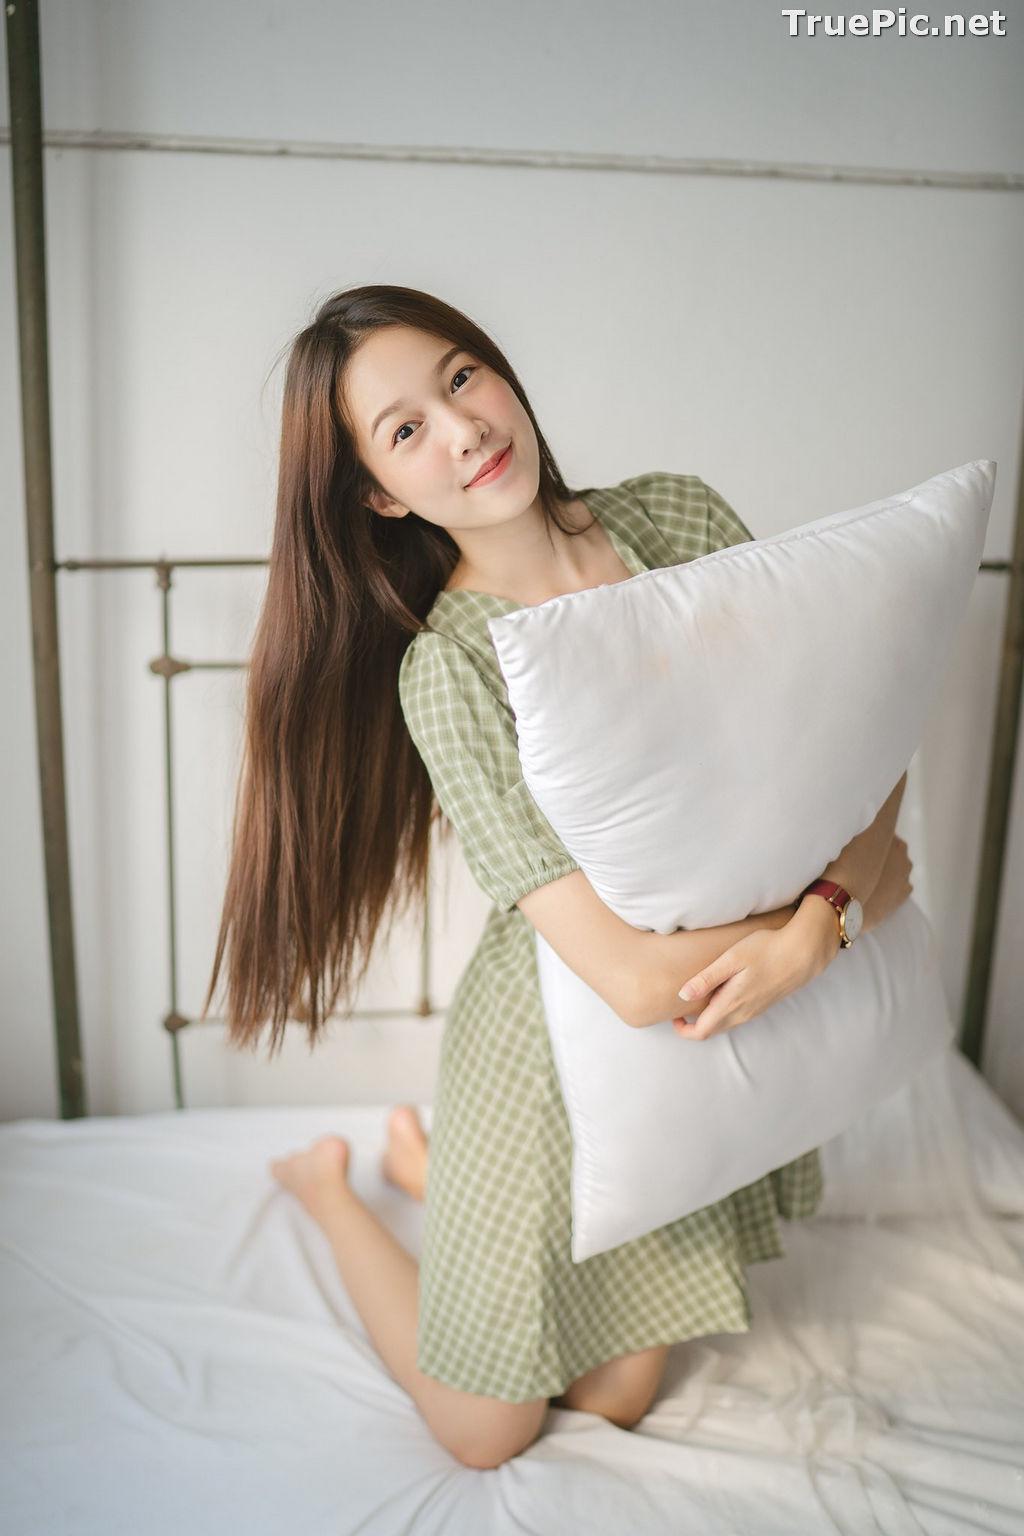 Image Thailand Cute Model - Pimpisa Kitiwinit - Milk Tea Girl - TruePic.net - Picture-3